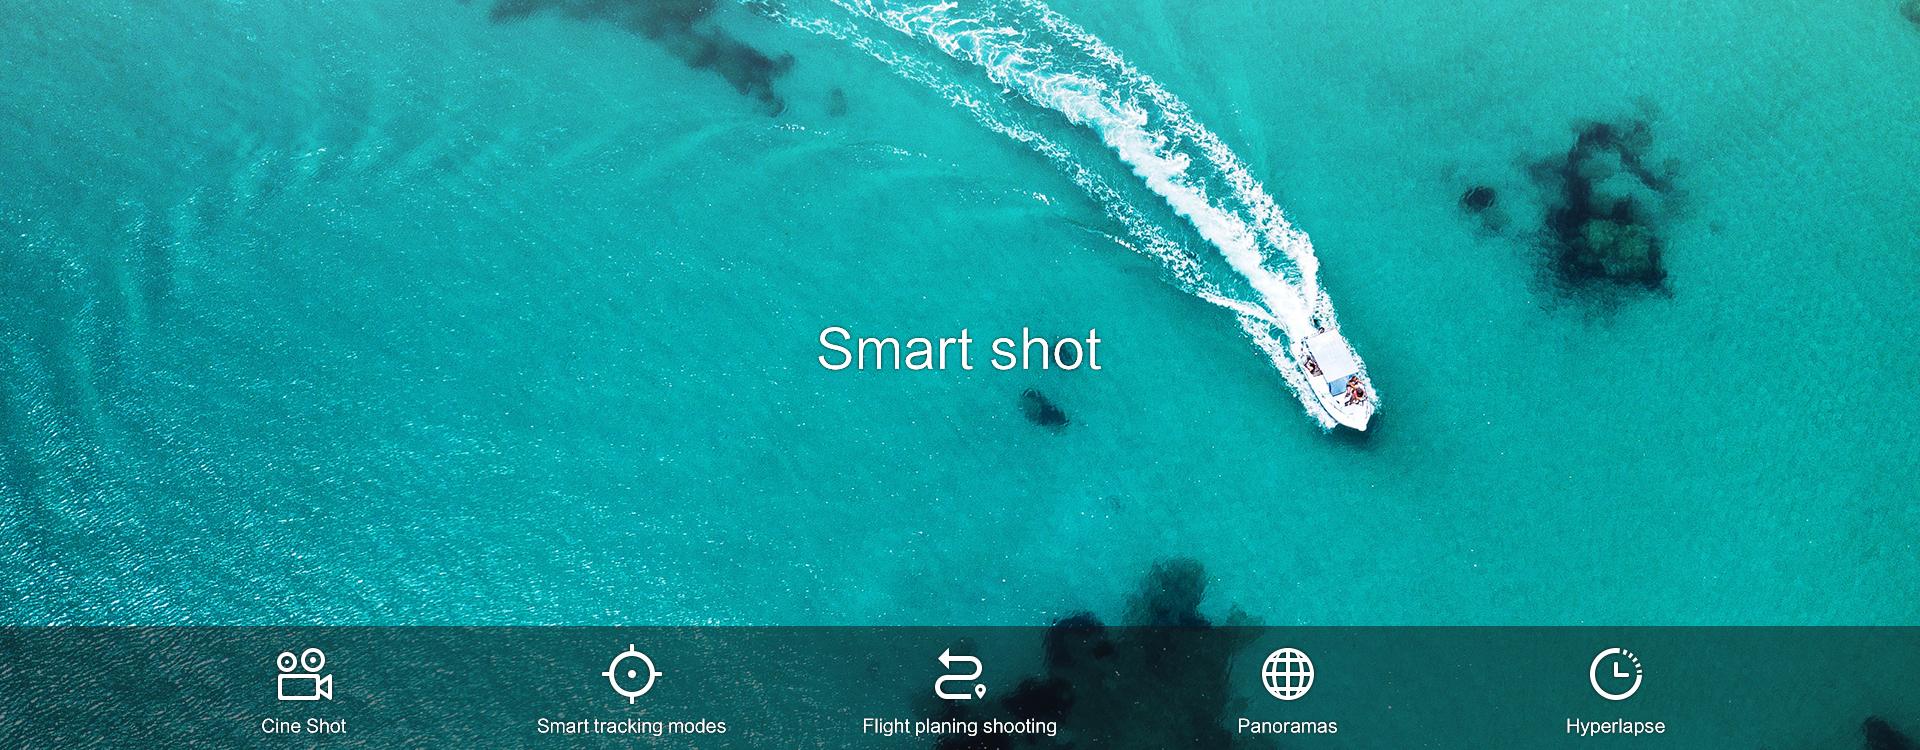 smart shot xiaomi fimi x8 se